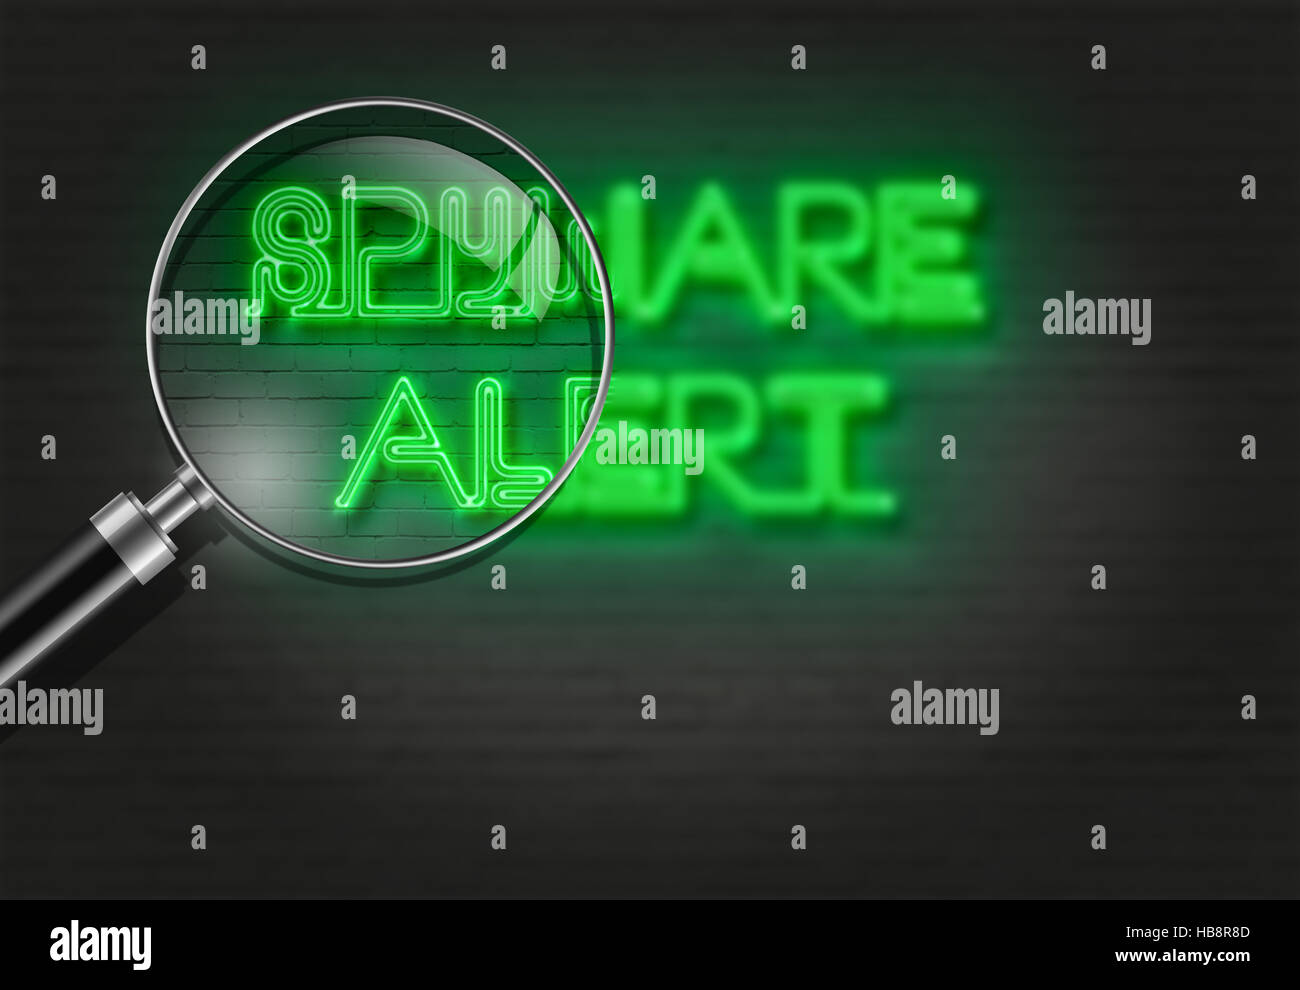 ALERTA DE SPYWARE Imagen De Stock